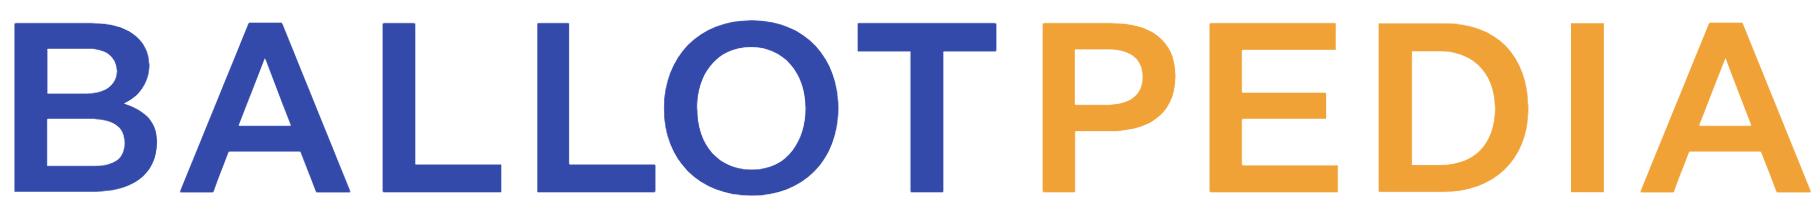 Ballotpedia graphic